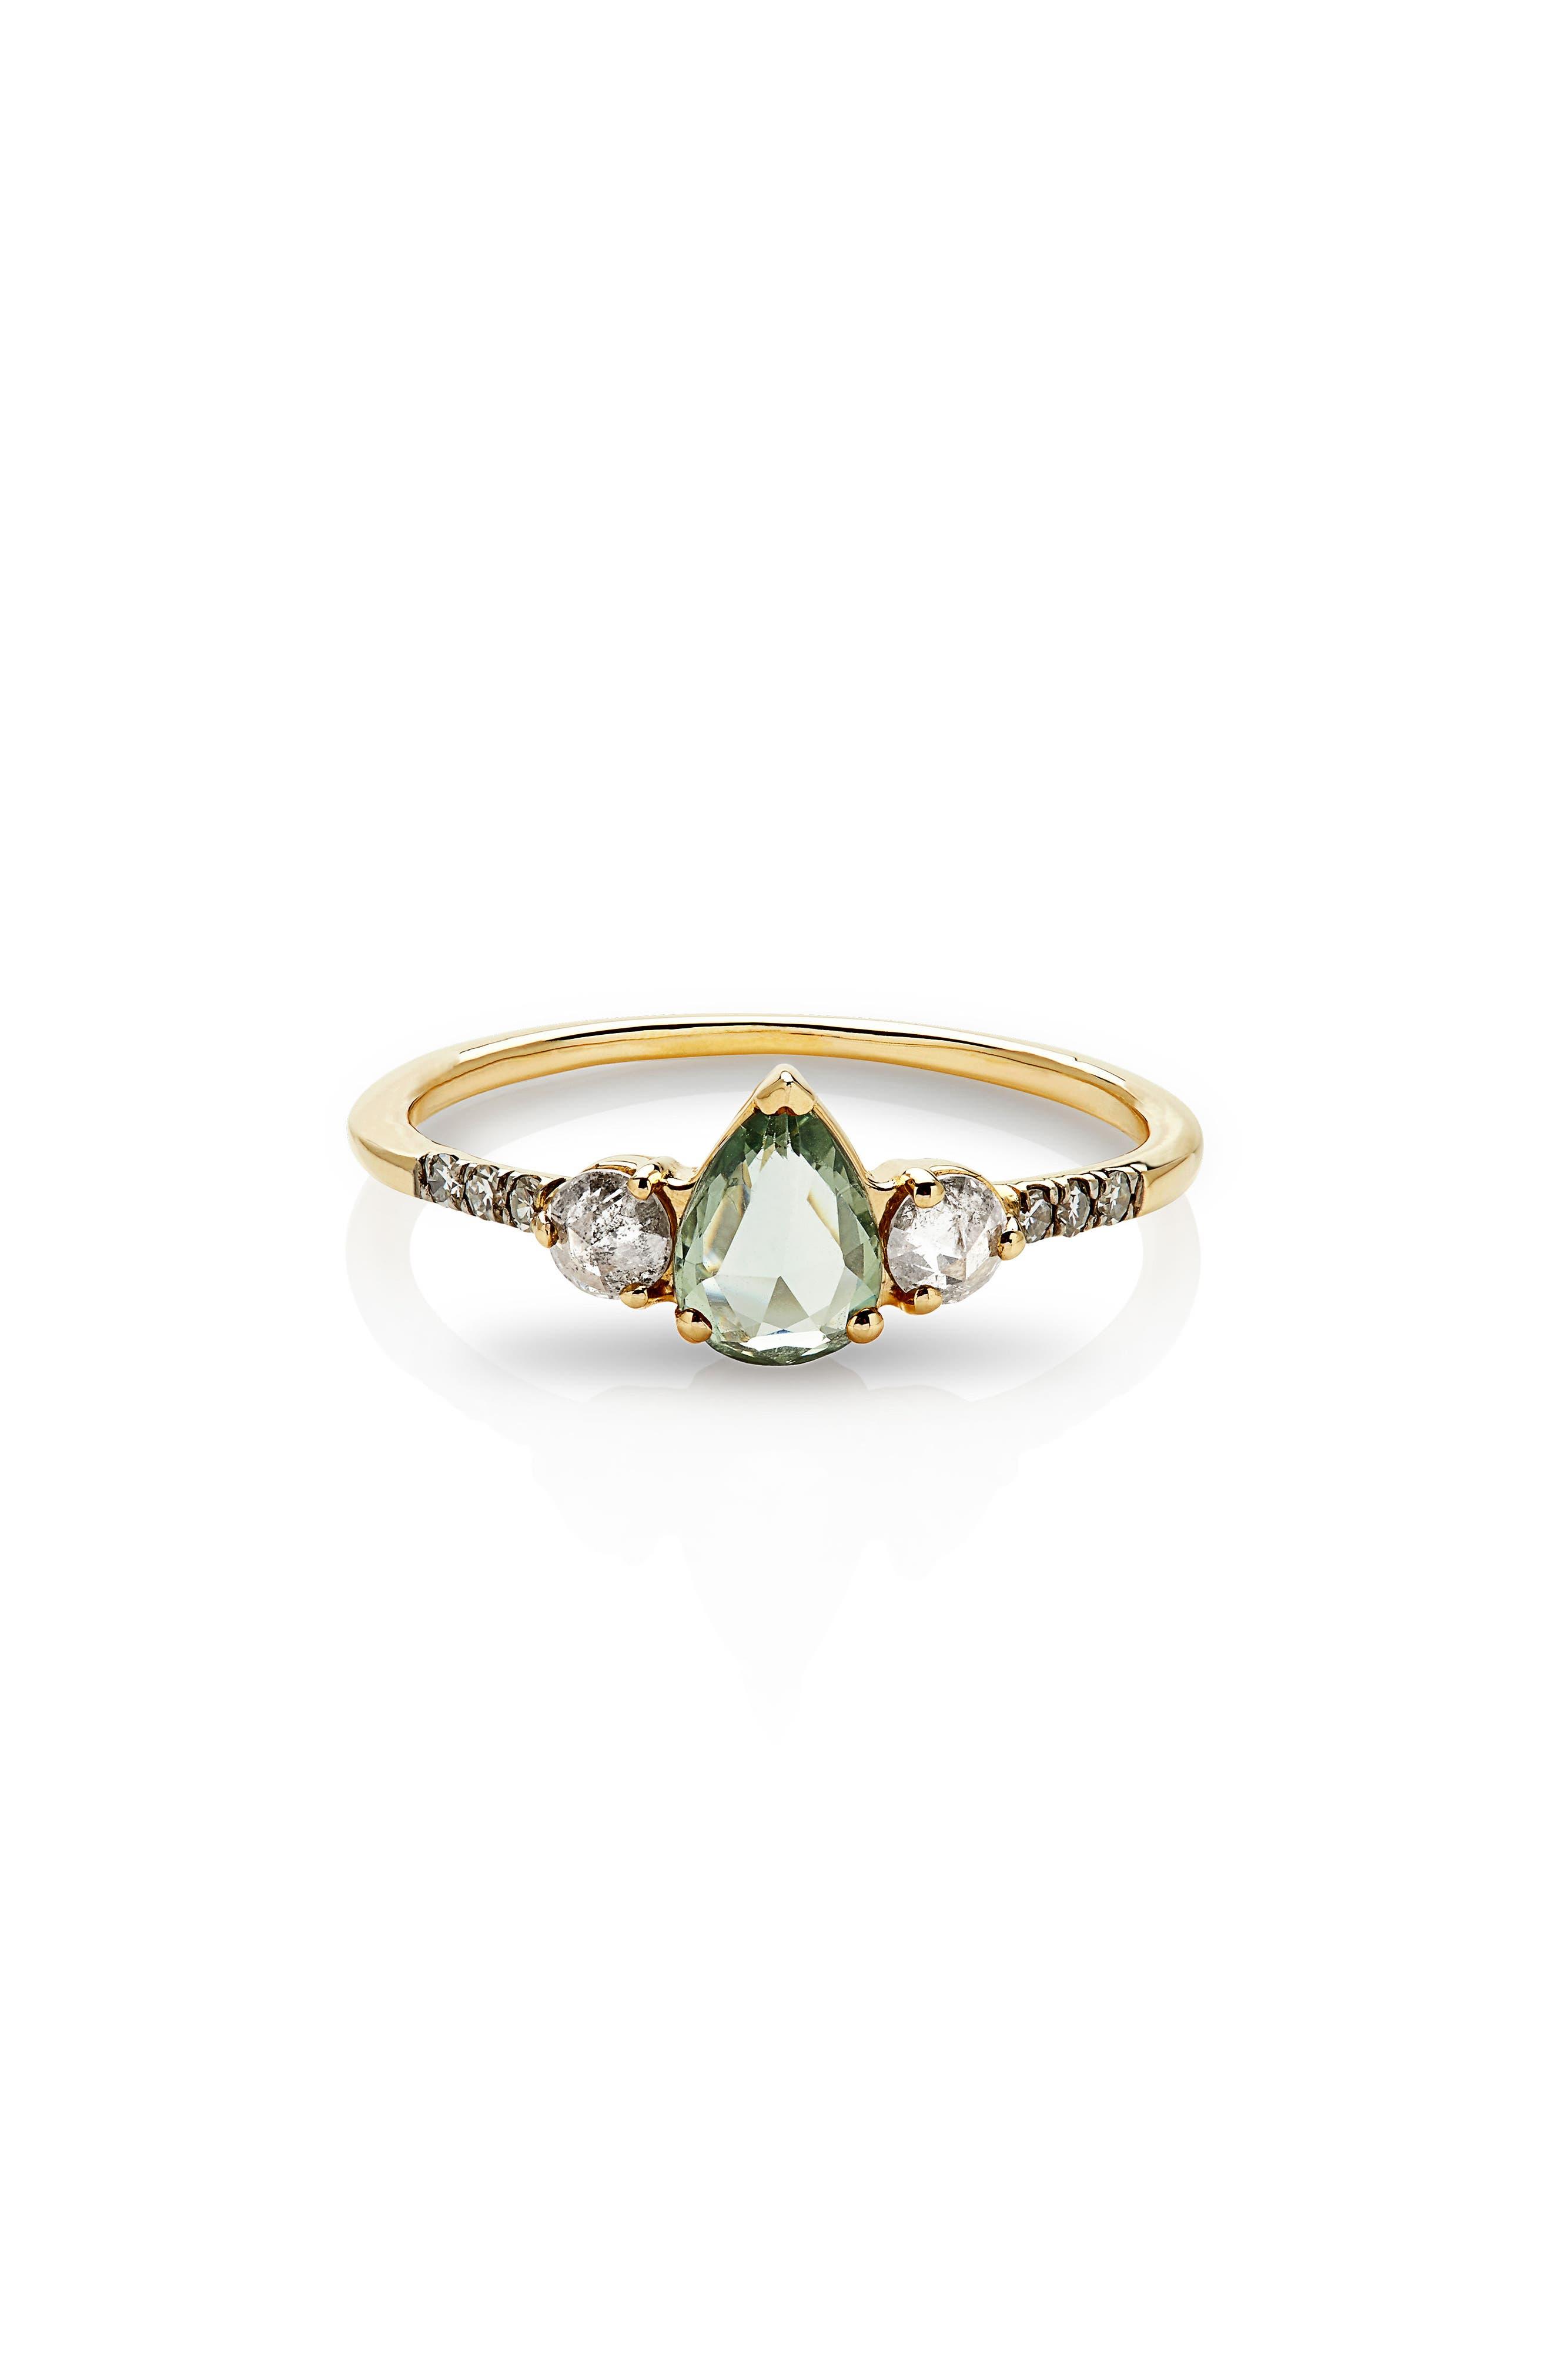 Radiance Sapphire & Diamond Ring,                         Main,                         color, Yellow Gold/ Green Sapphire